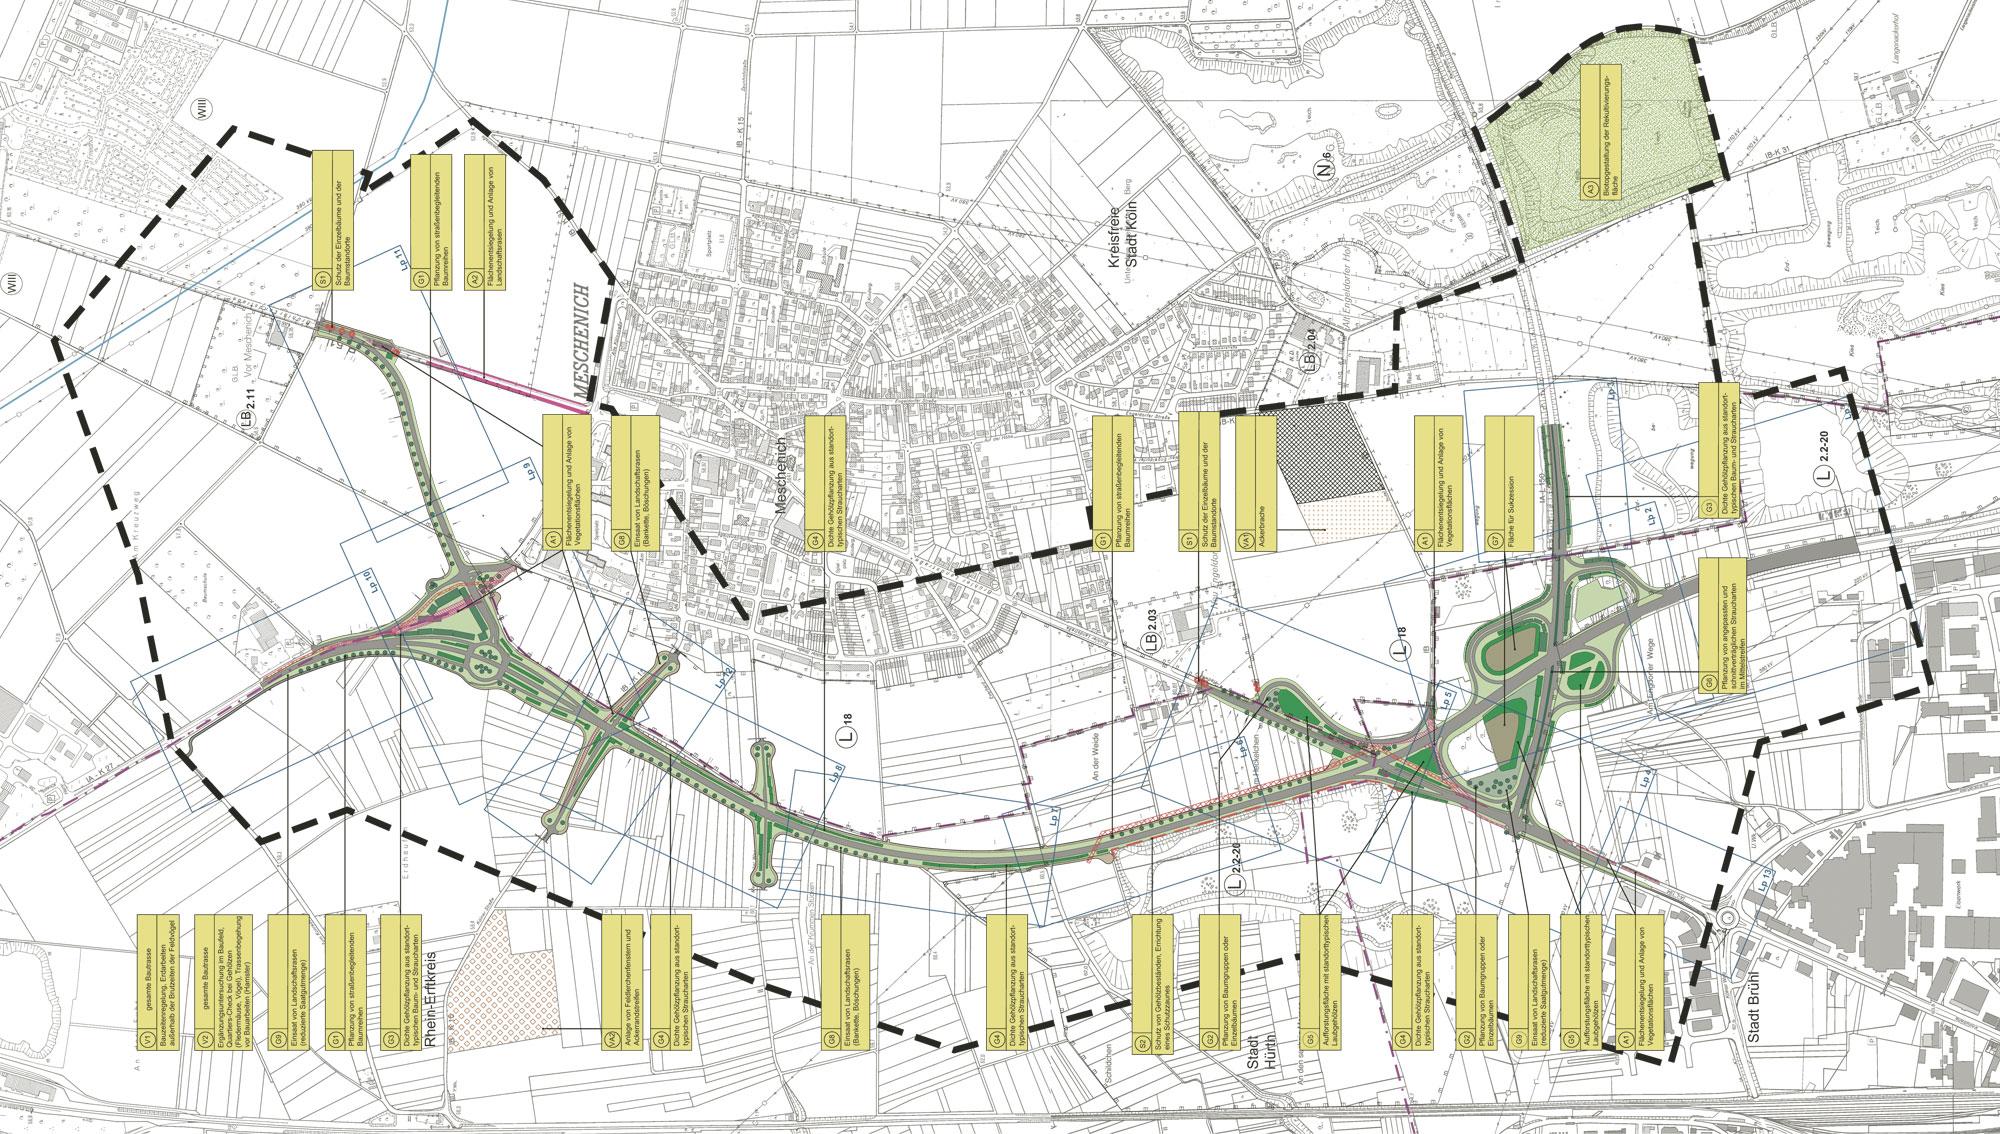 Rmp stephan lenzen landschaftsarchitekten bypass b 51 n cologne meschenich - Landschaftsarchitekten koln ...